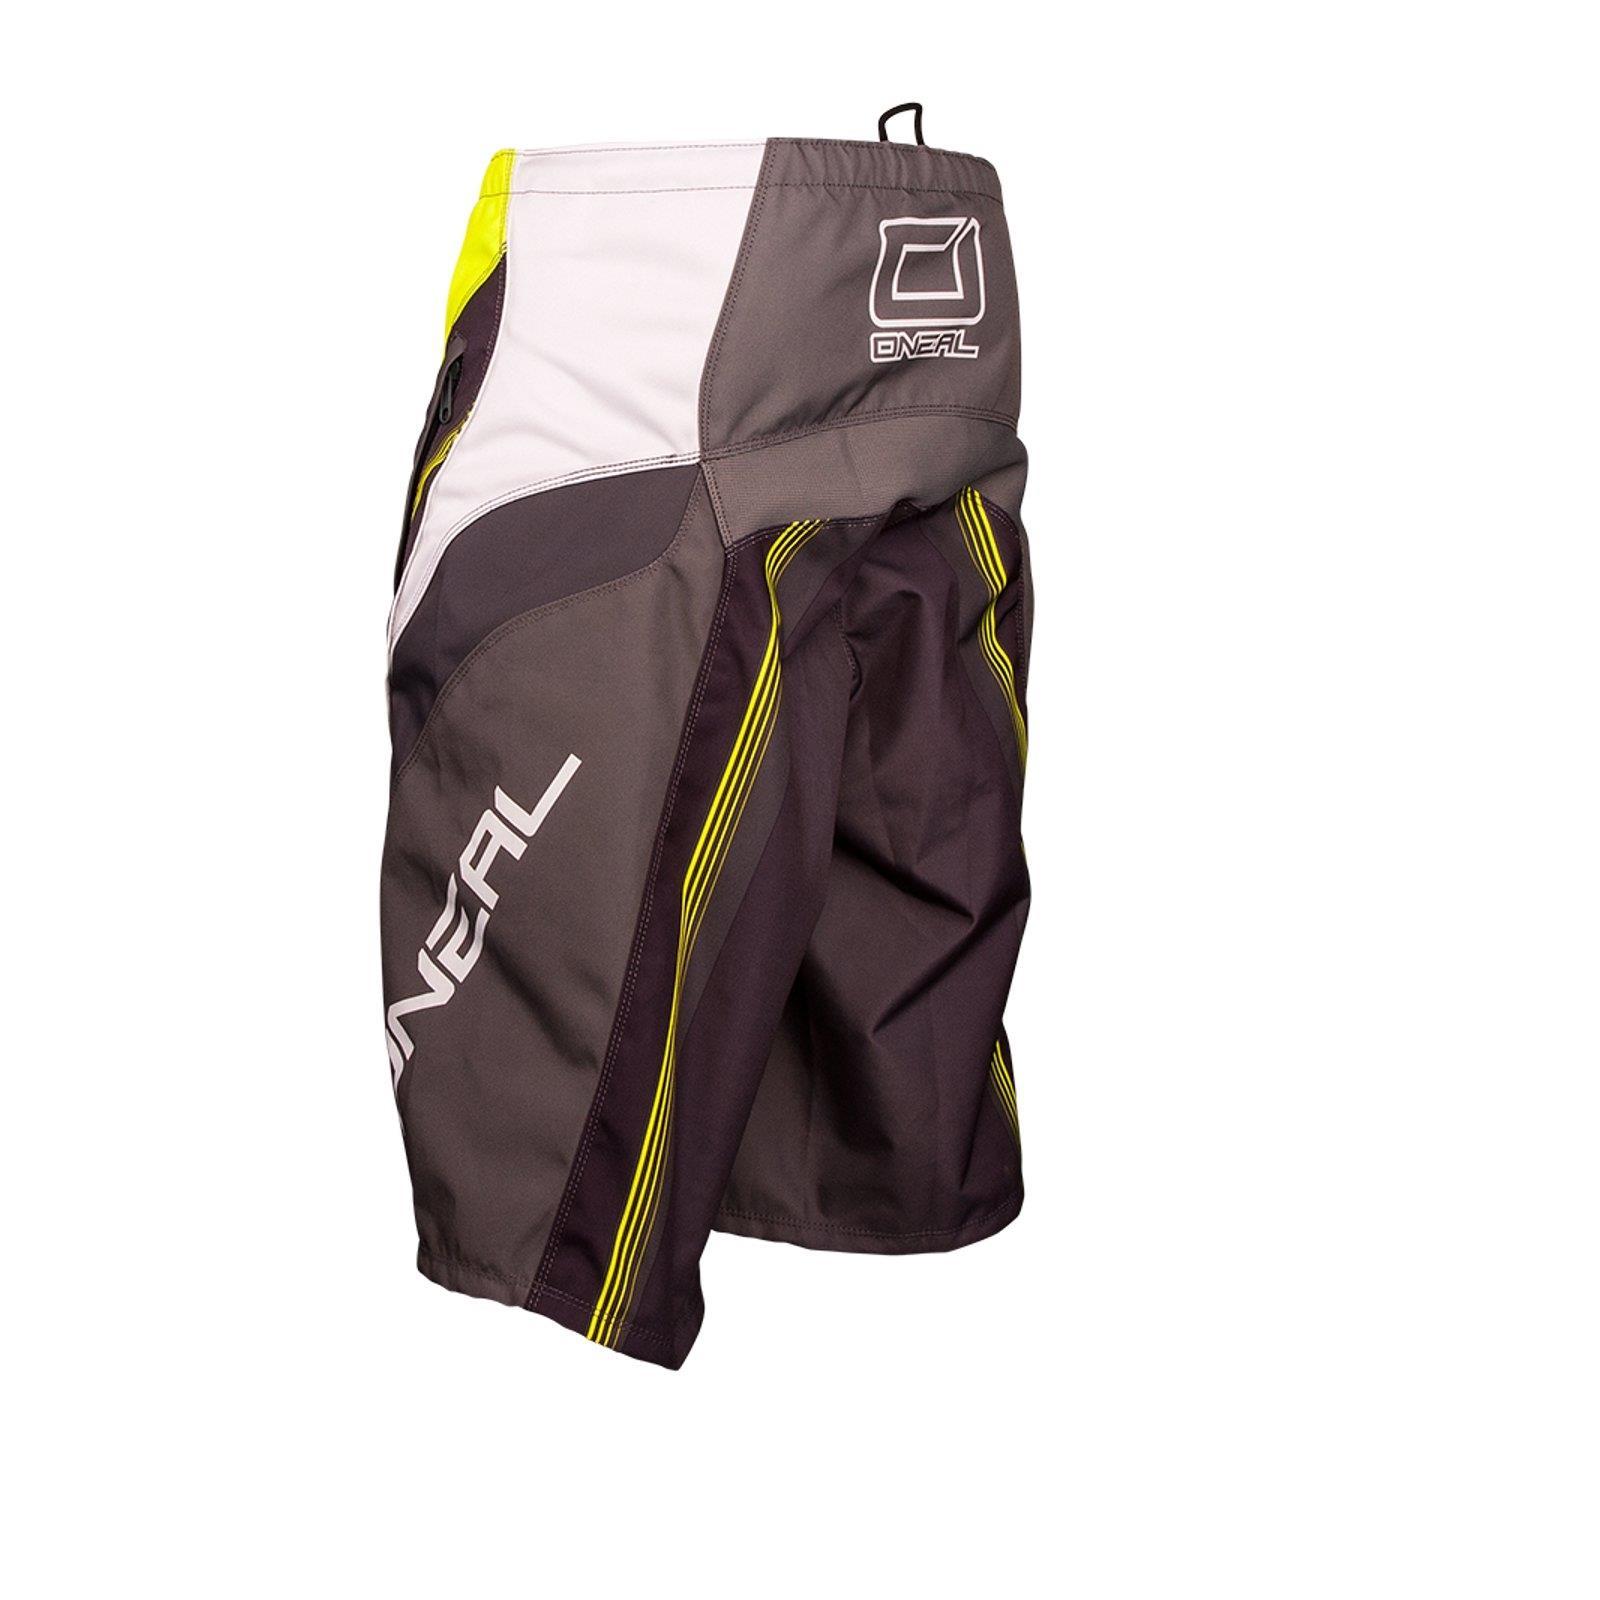 ONEAL-Element-FR-Short-Giallo-MTB-DH-MX-CROSS-SHORTS-PANTALONI-Downhill-Mountain-Bike-FR miniatura 9